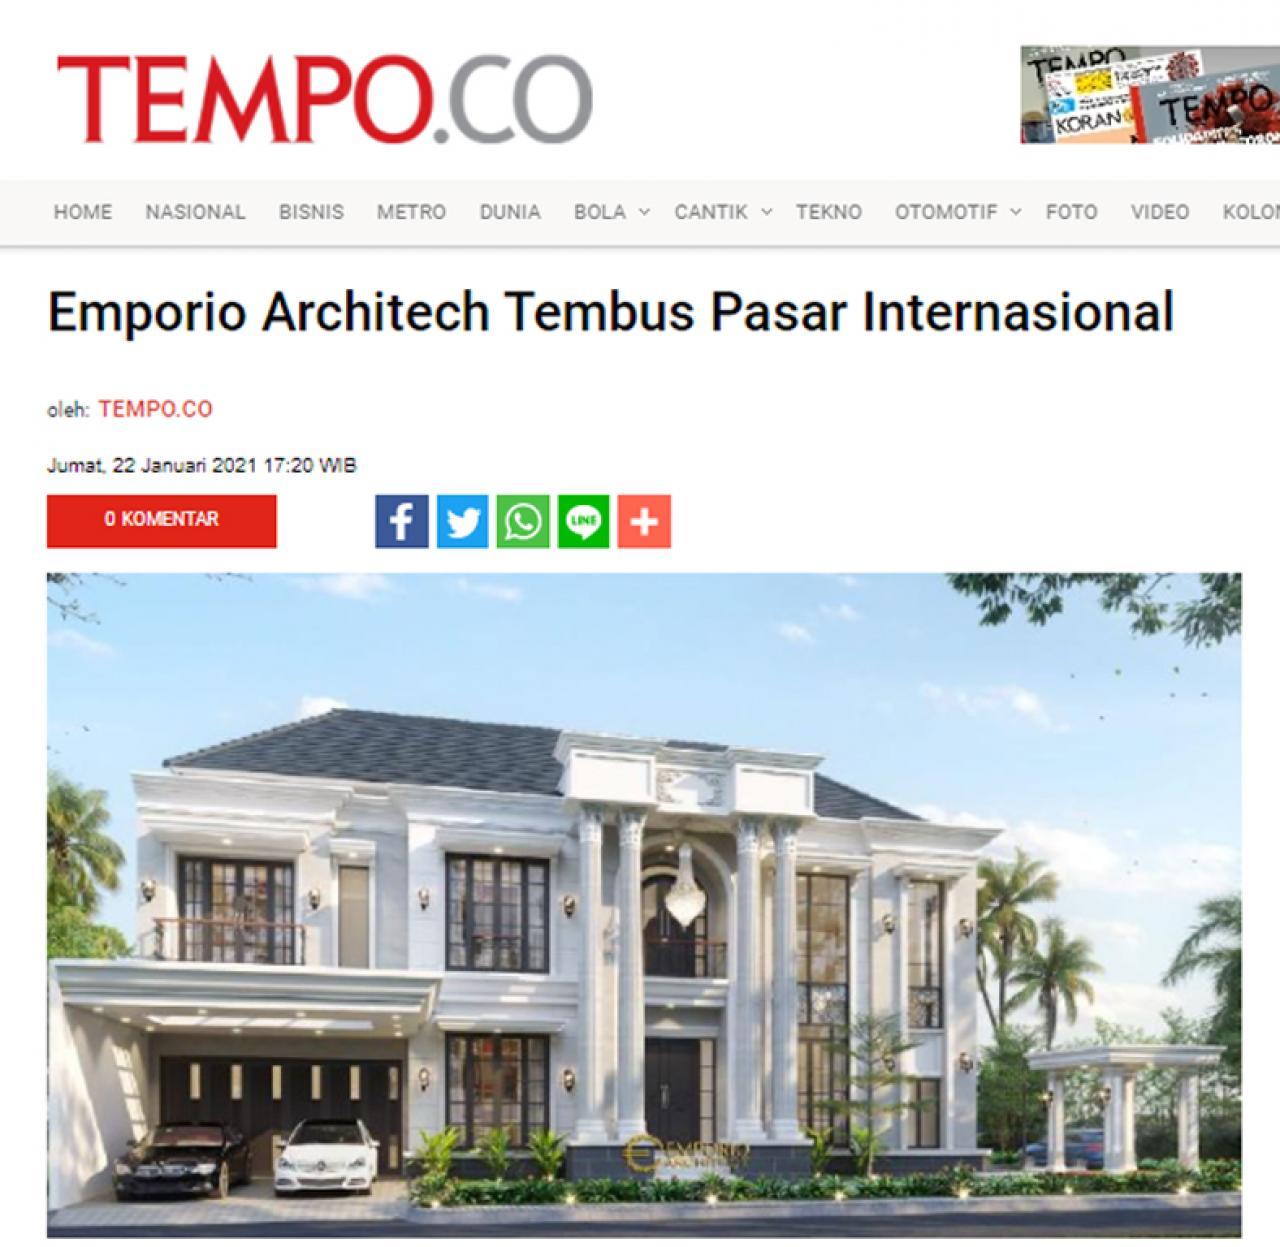 Ulasan Media TEMPO.co - Emporio Architect Tembus Pasar Internasional